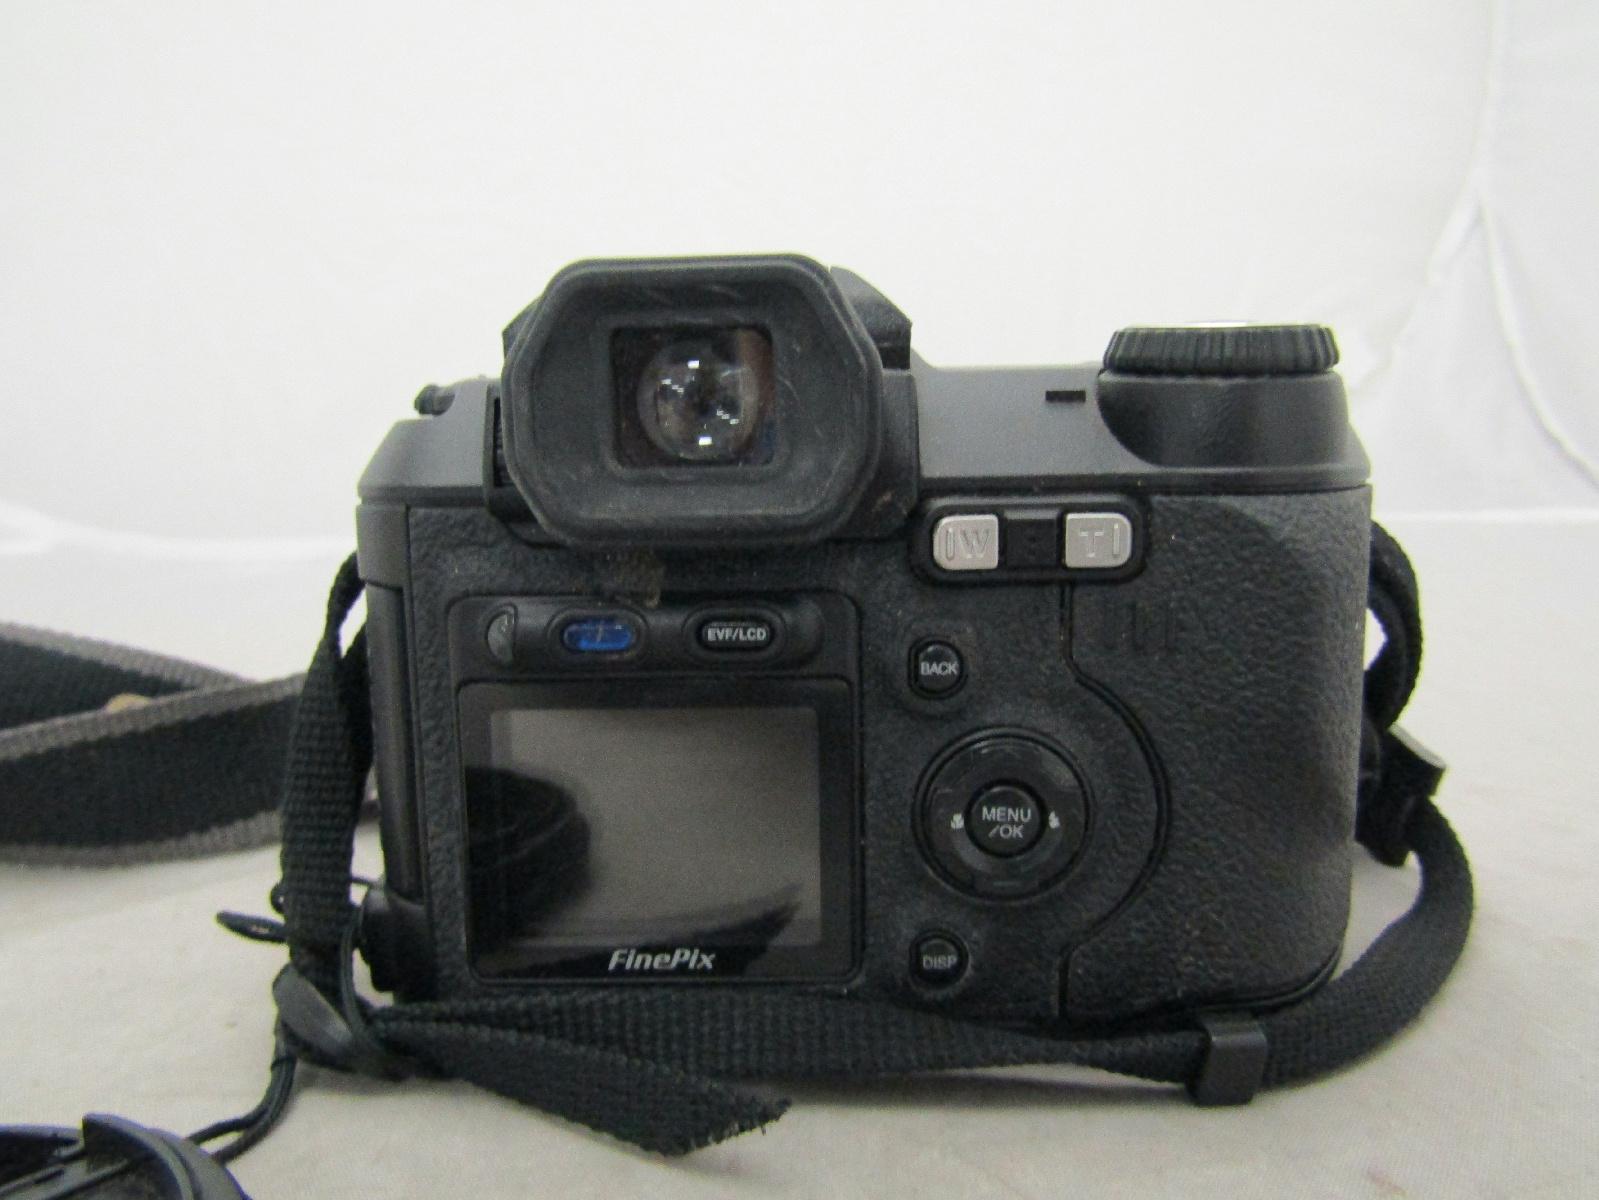 Fujifilm finepix s5000 digital camera 10x optical zoom 2 for Fujifilm finepix s5000 prix